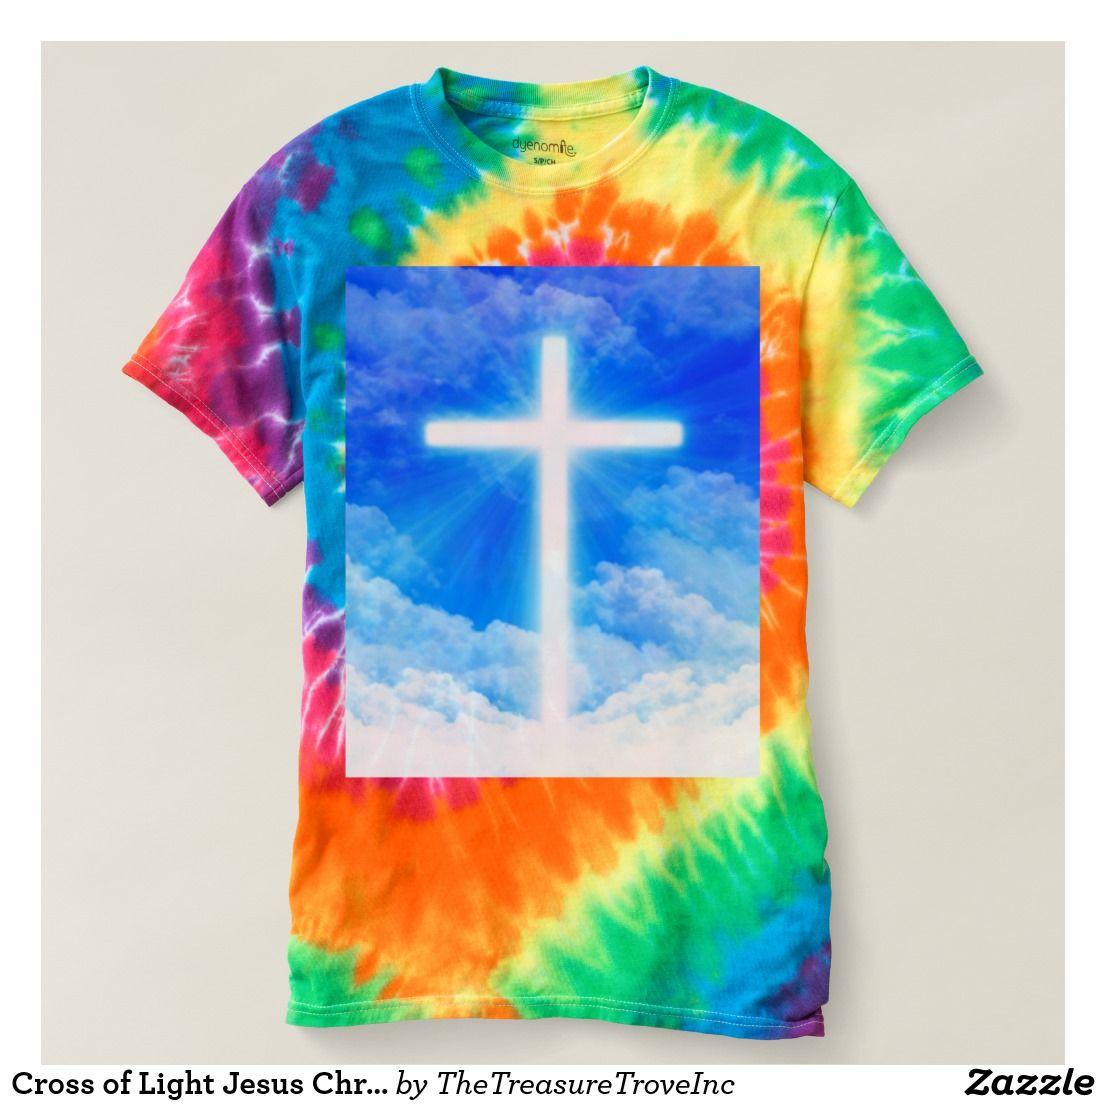 Cross Of Light Jesus Christ Customizable Christian Design The Cross Of Light Symbolizing The Love And Grace Christian Messages Jesus Shirts Christian Designs